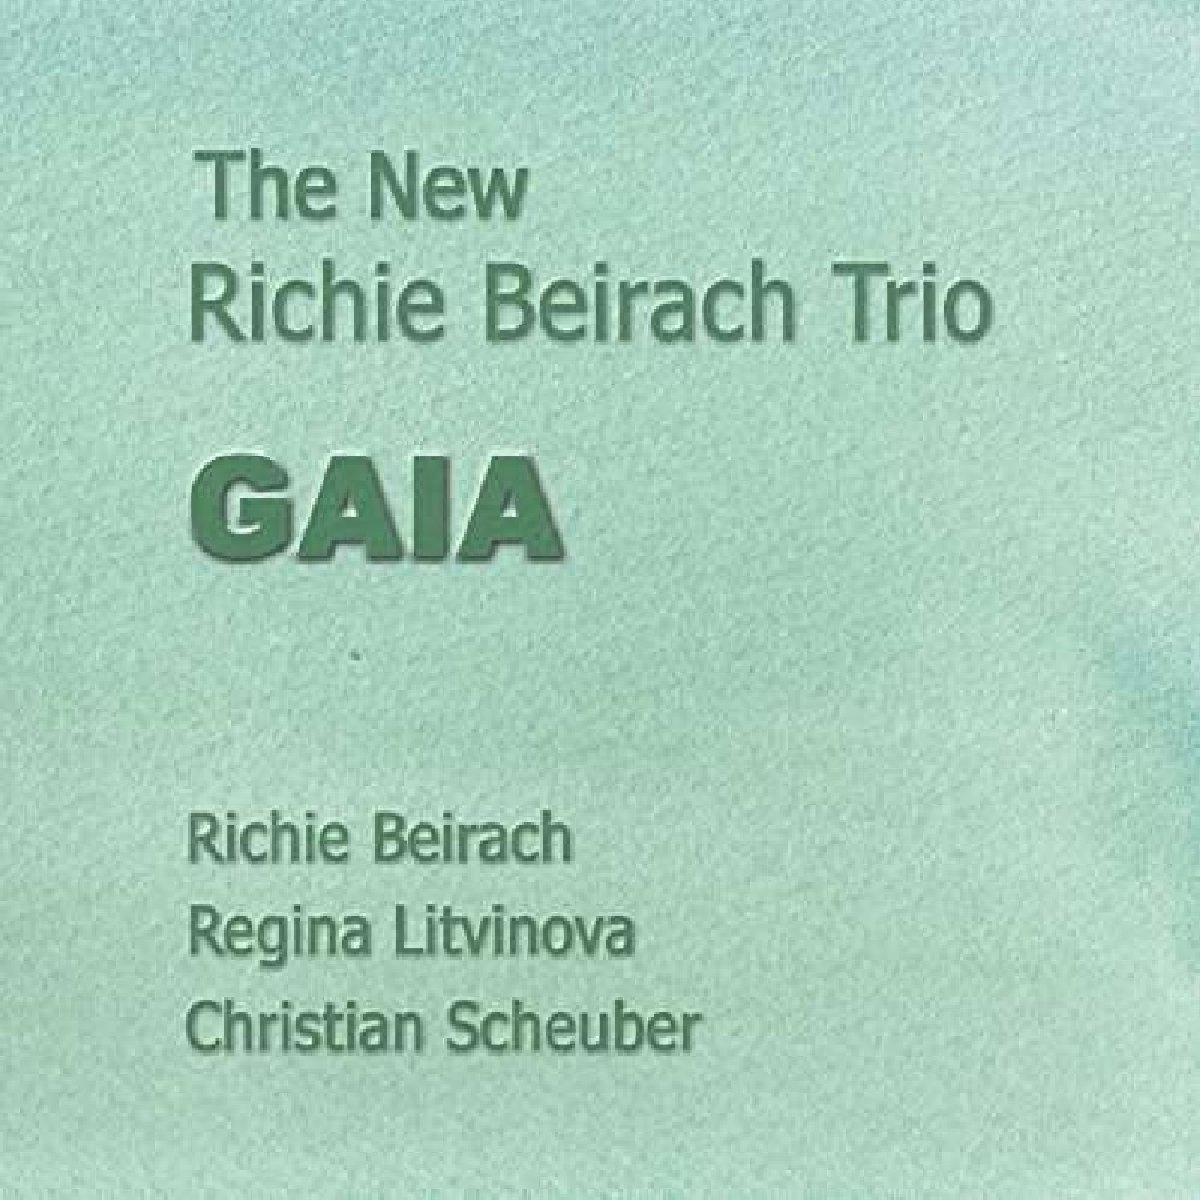 Richie Beirach - Gaia (New Richie Beirach Trio) [No USA] (United Kingdom - Import)